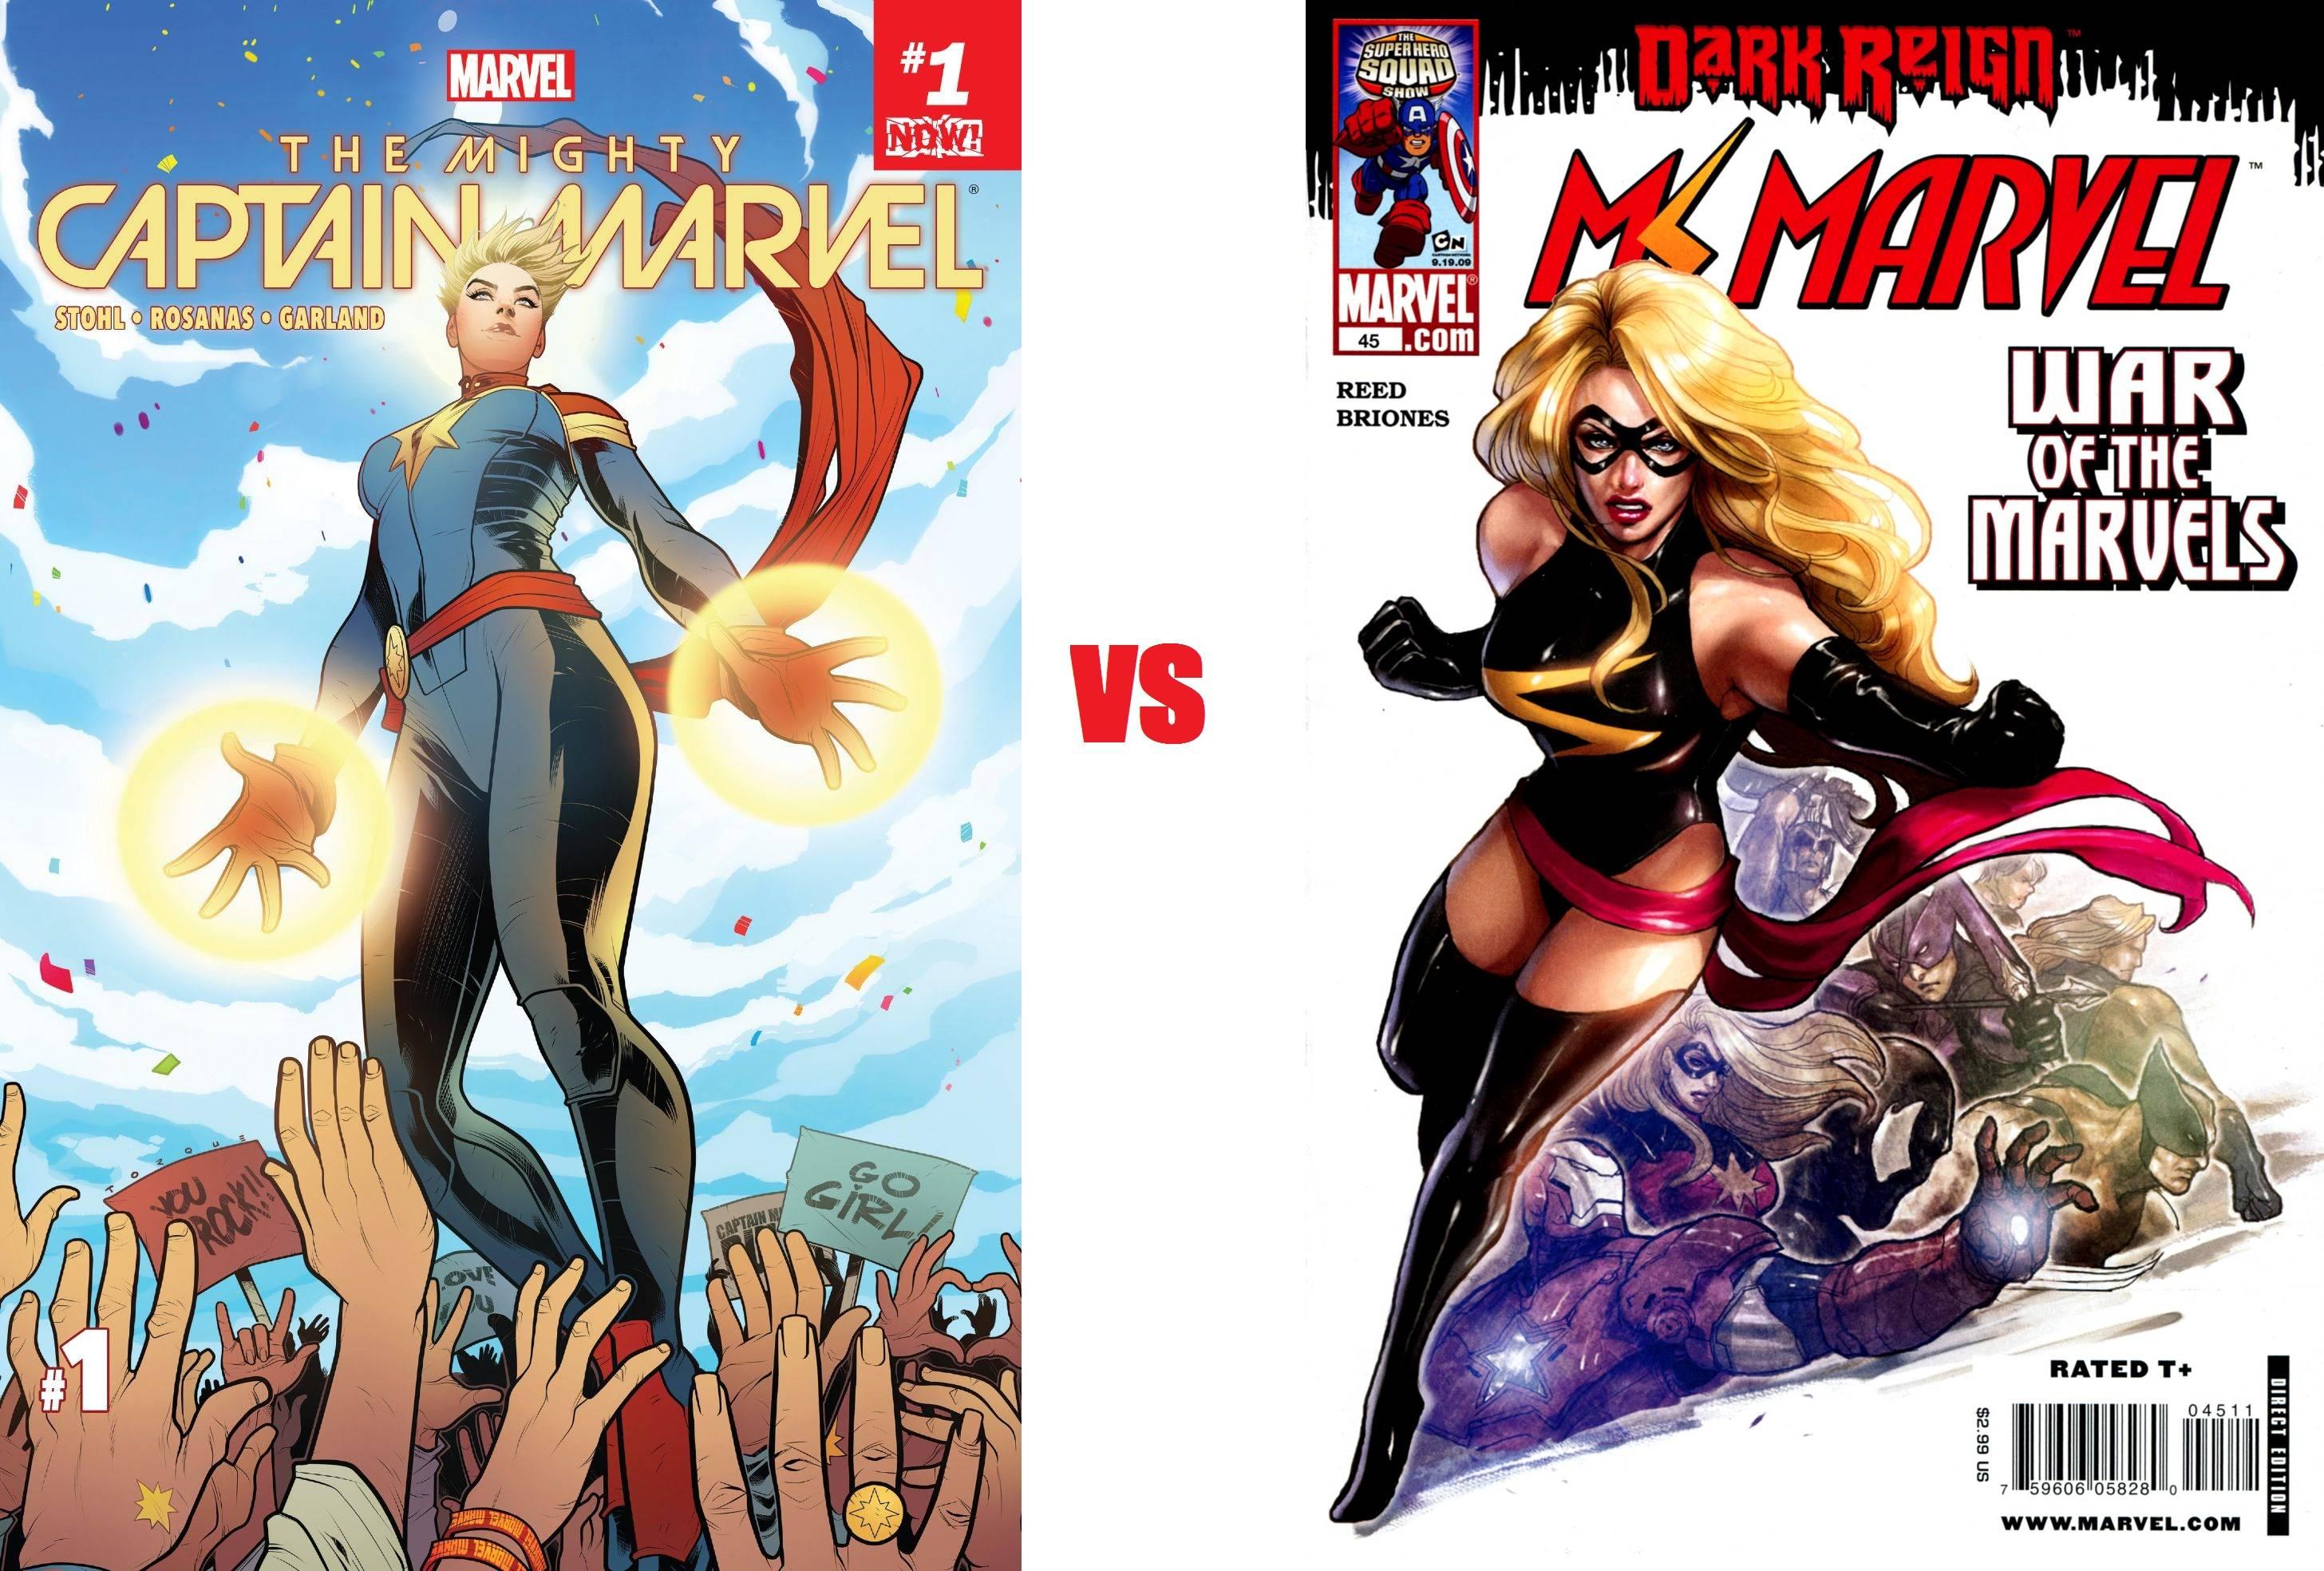 x men - captain marvel vs ms marvel clarification - science fiction